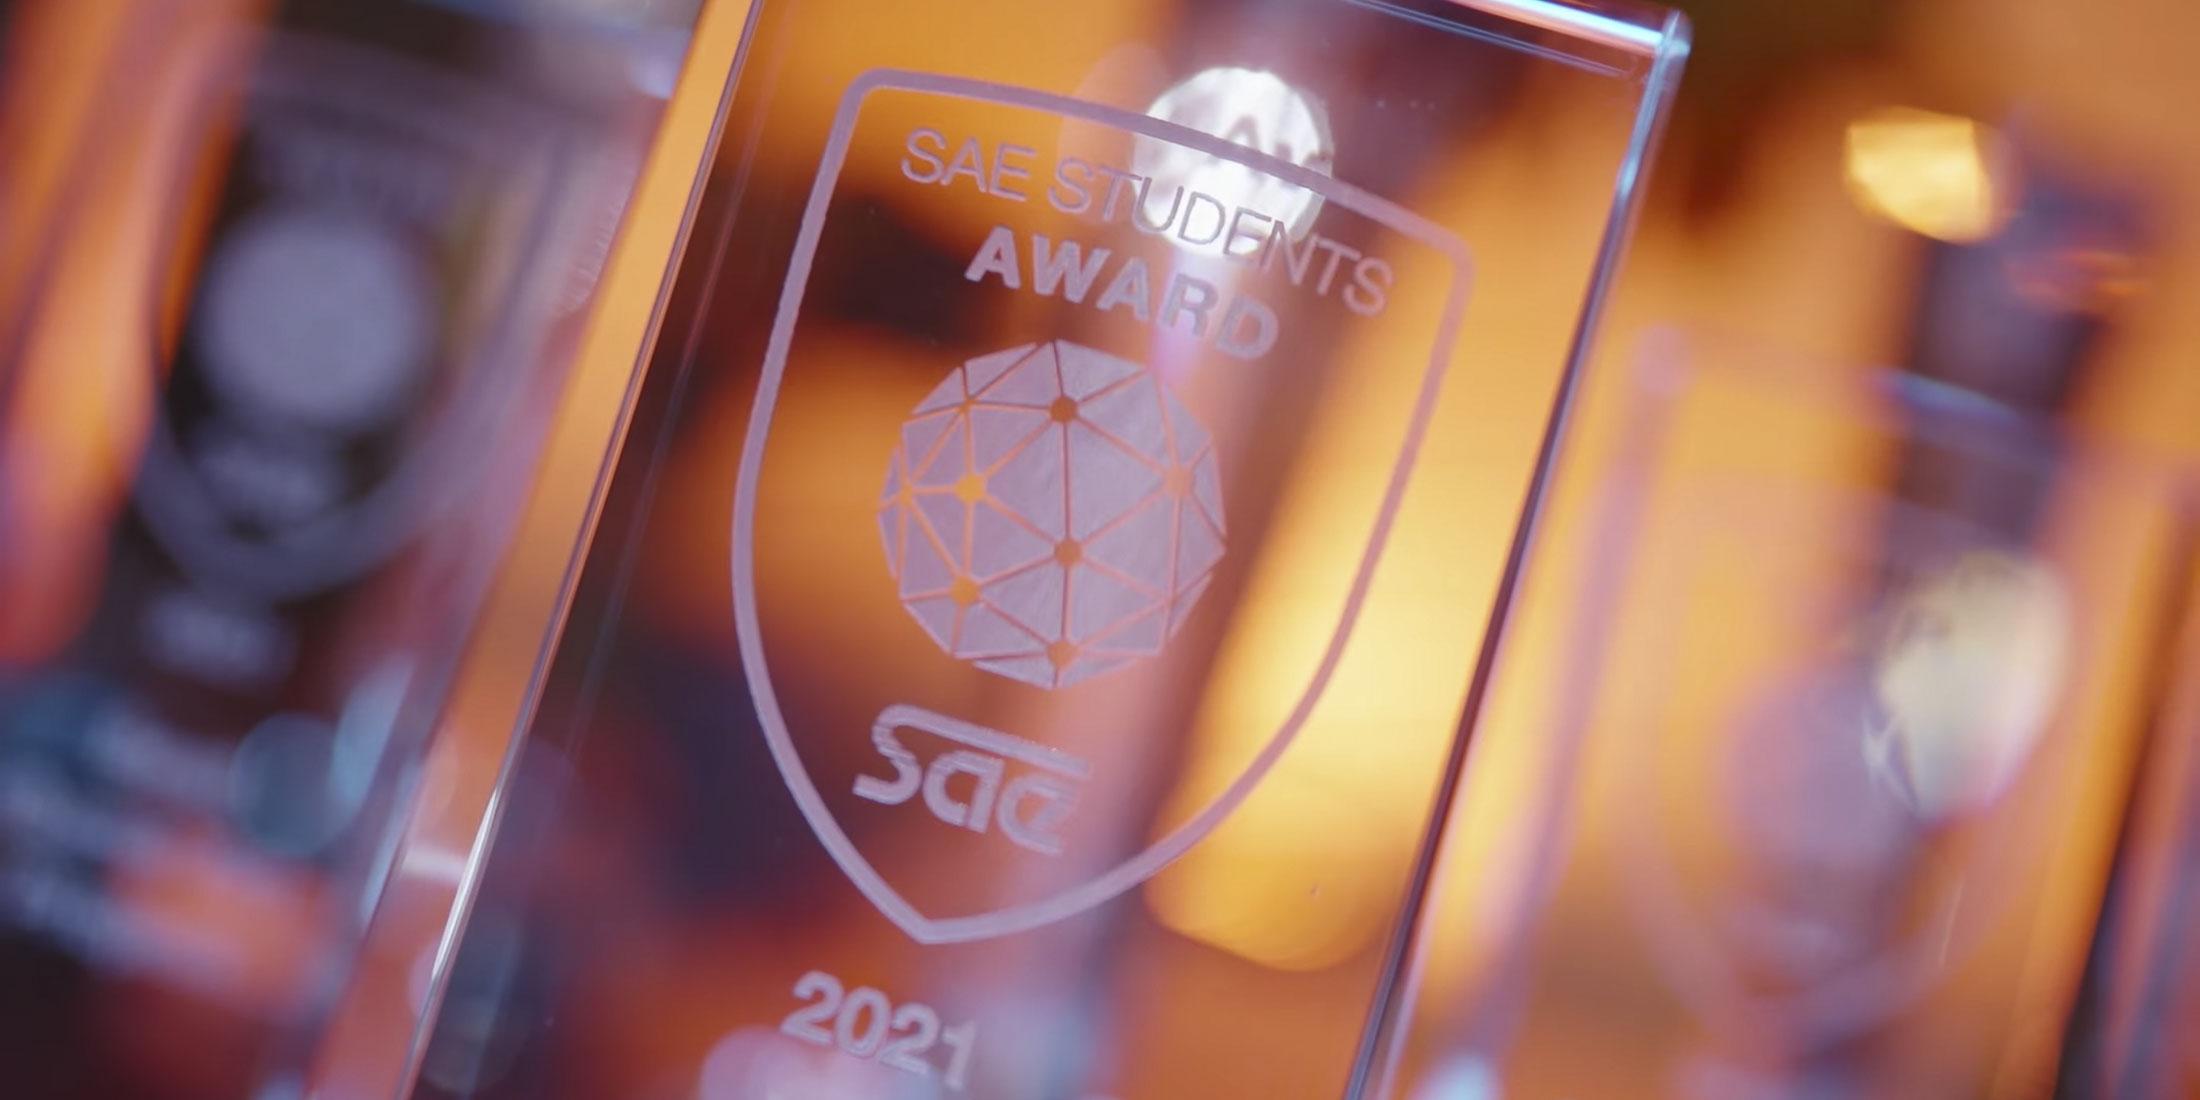 SAE Awards 2021: the winners!